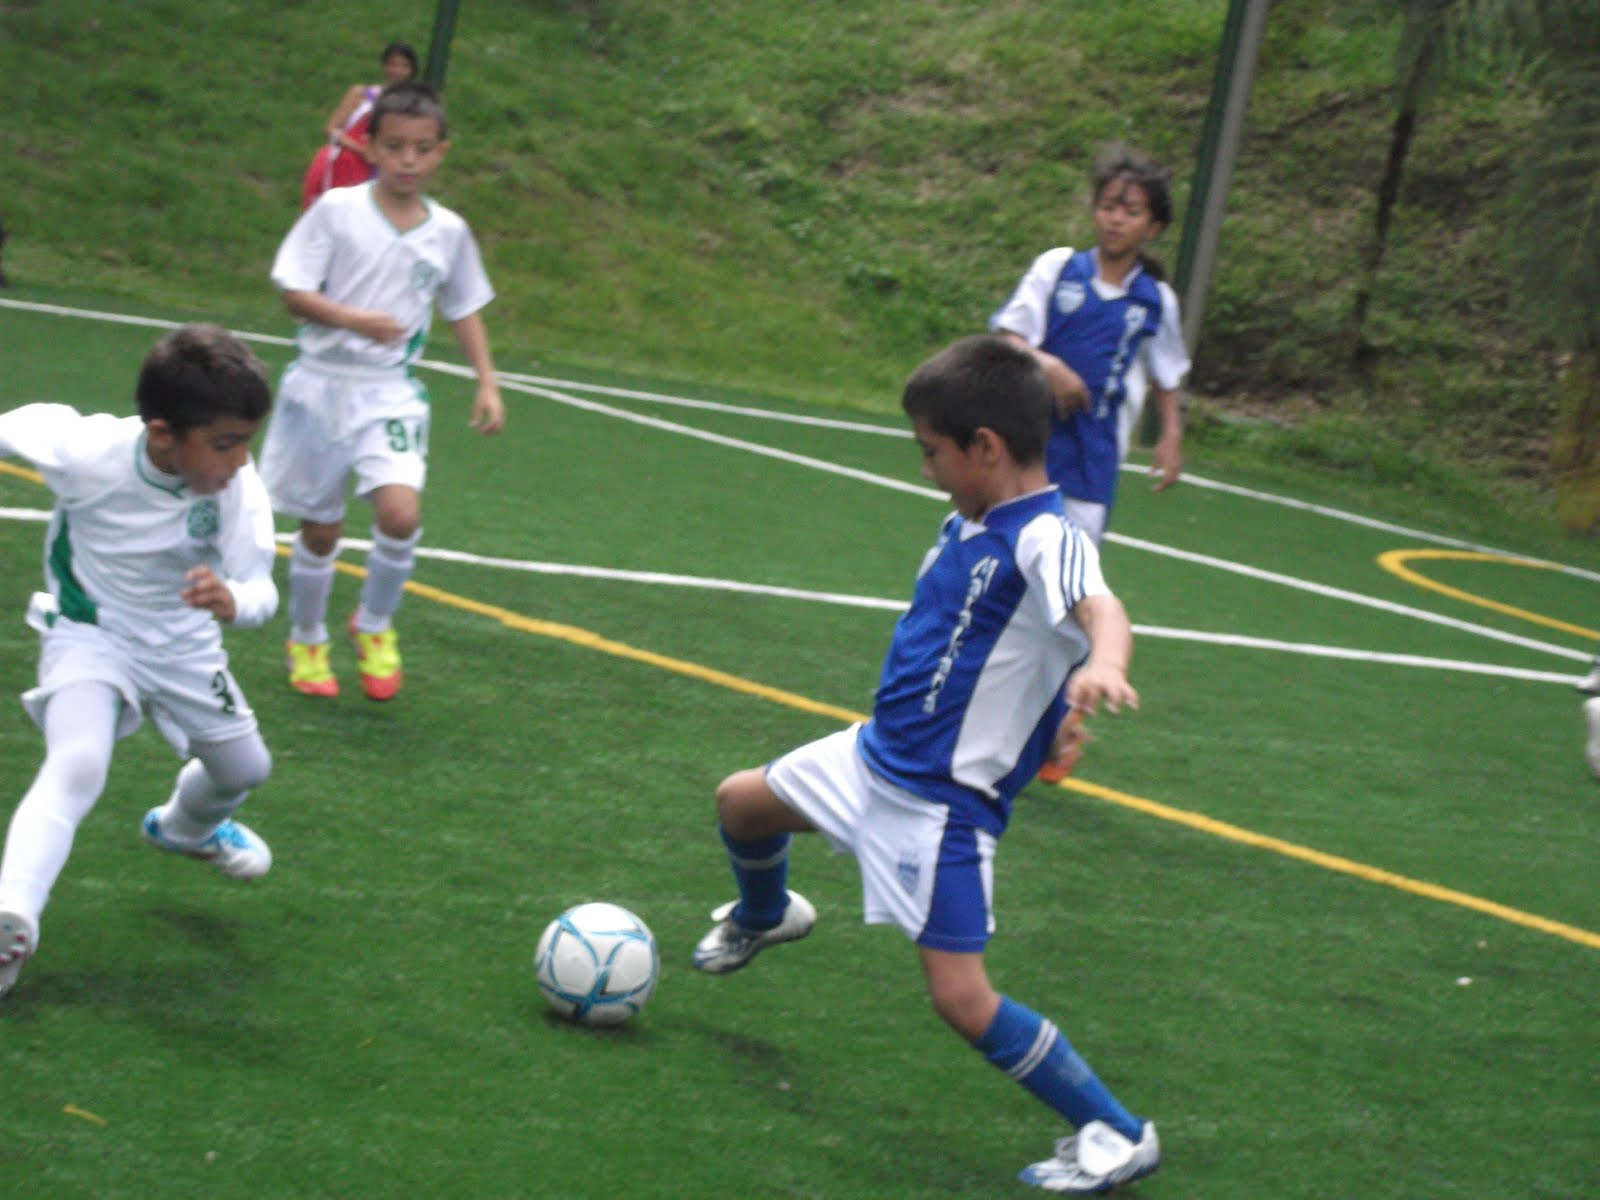 Imagenes De La Historia Del Futbol - HISTORIA DEL FUTBOL EN IMAGENES Facebook